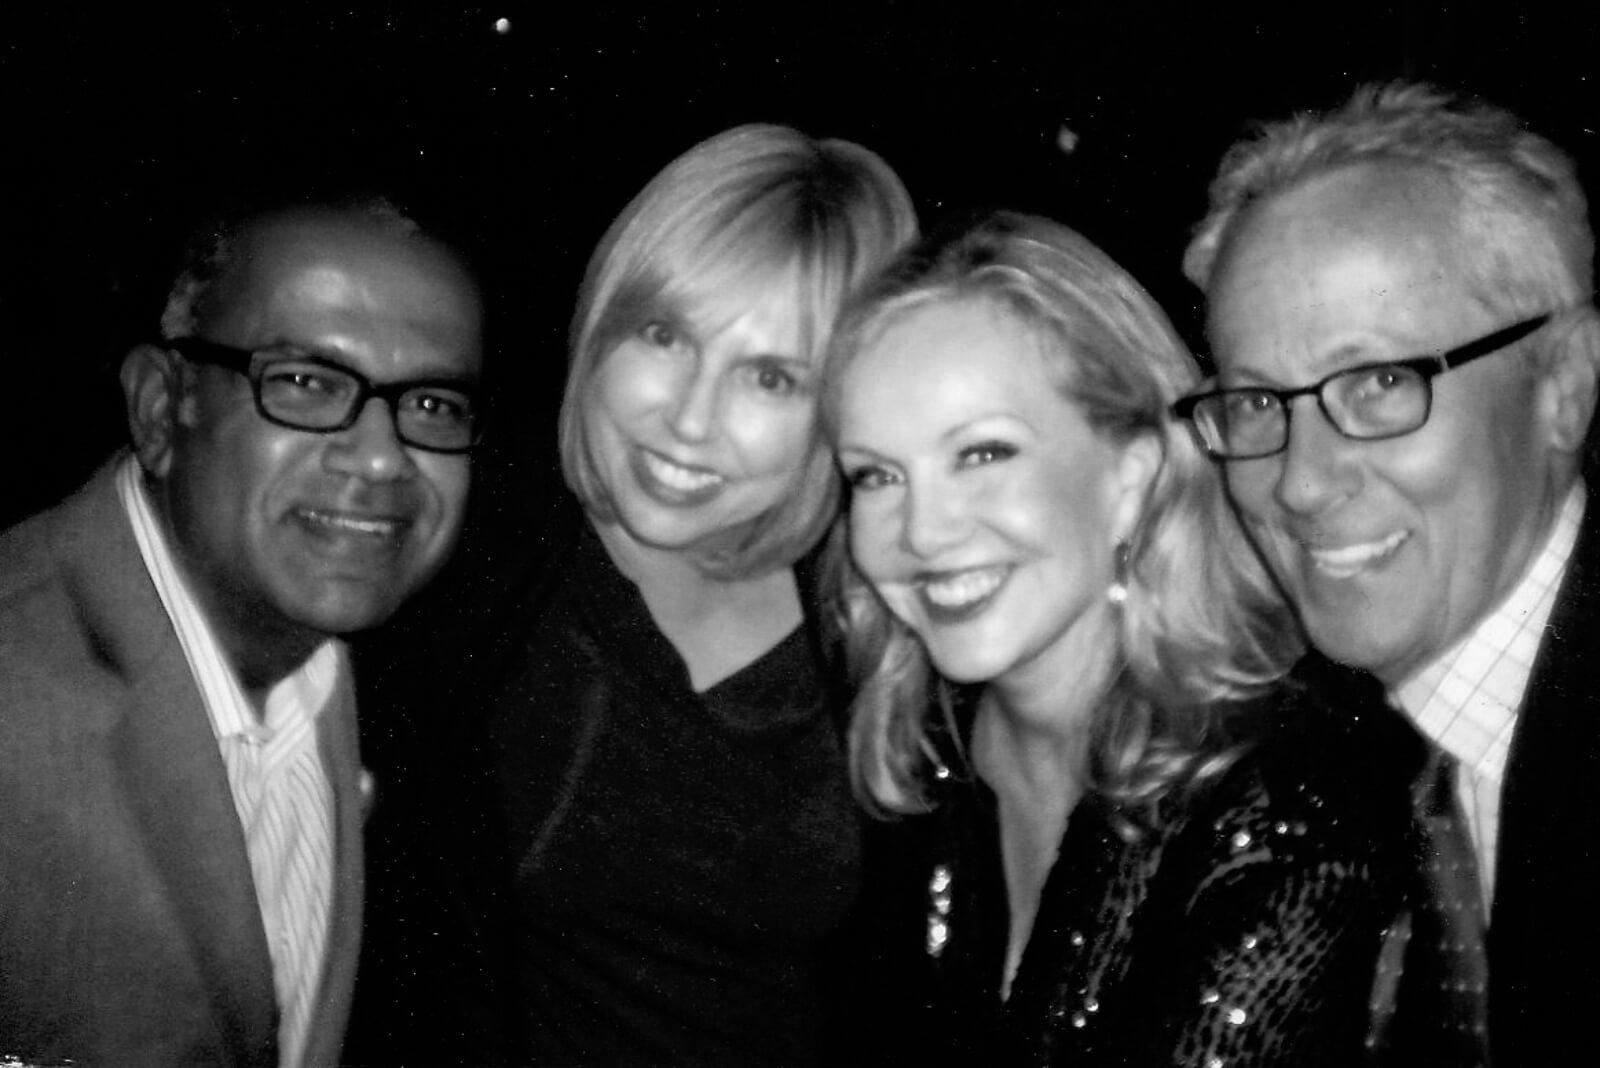 Black and white photo of Andric Bowen, Jessica Lichtner, Susan Stroman, and Bill Hoffman